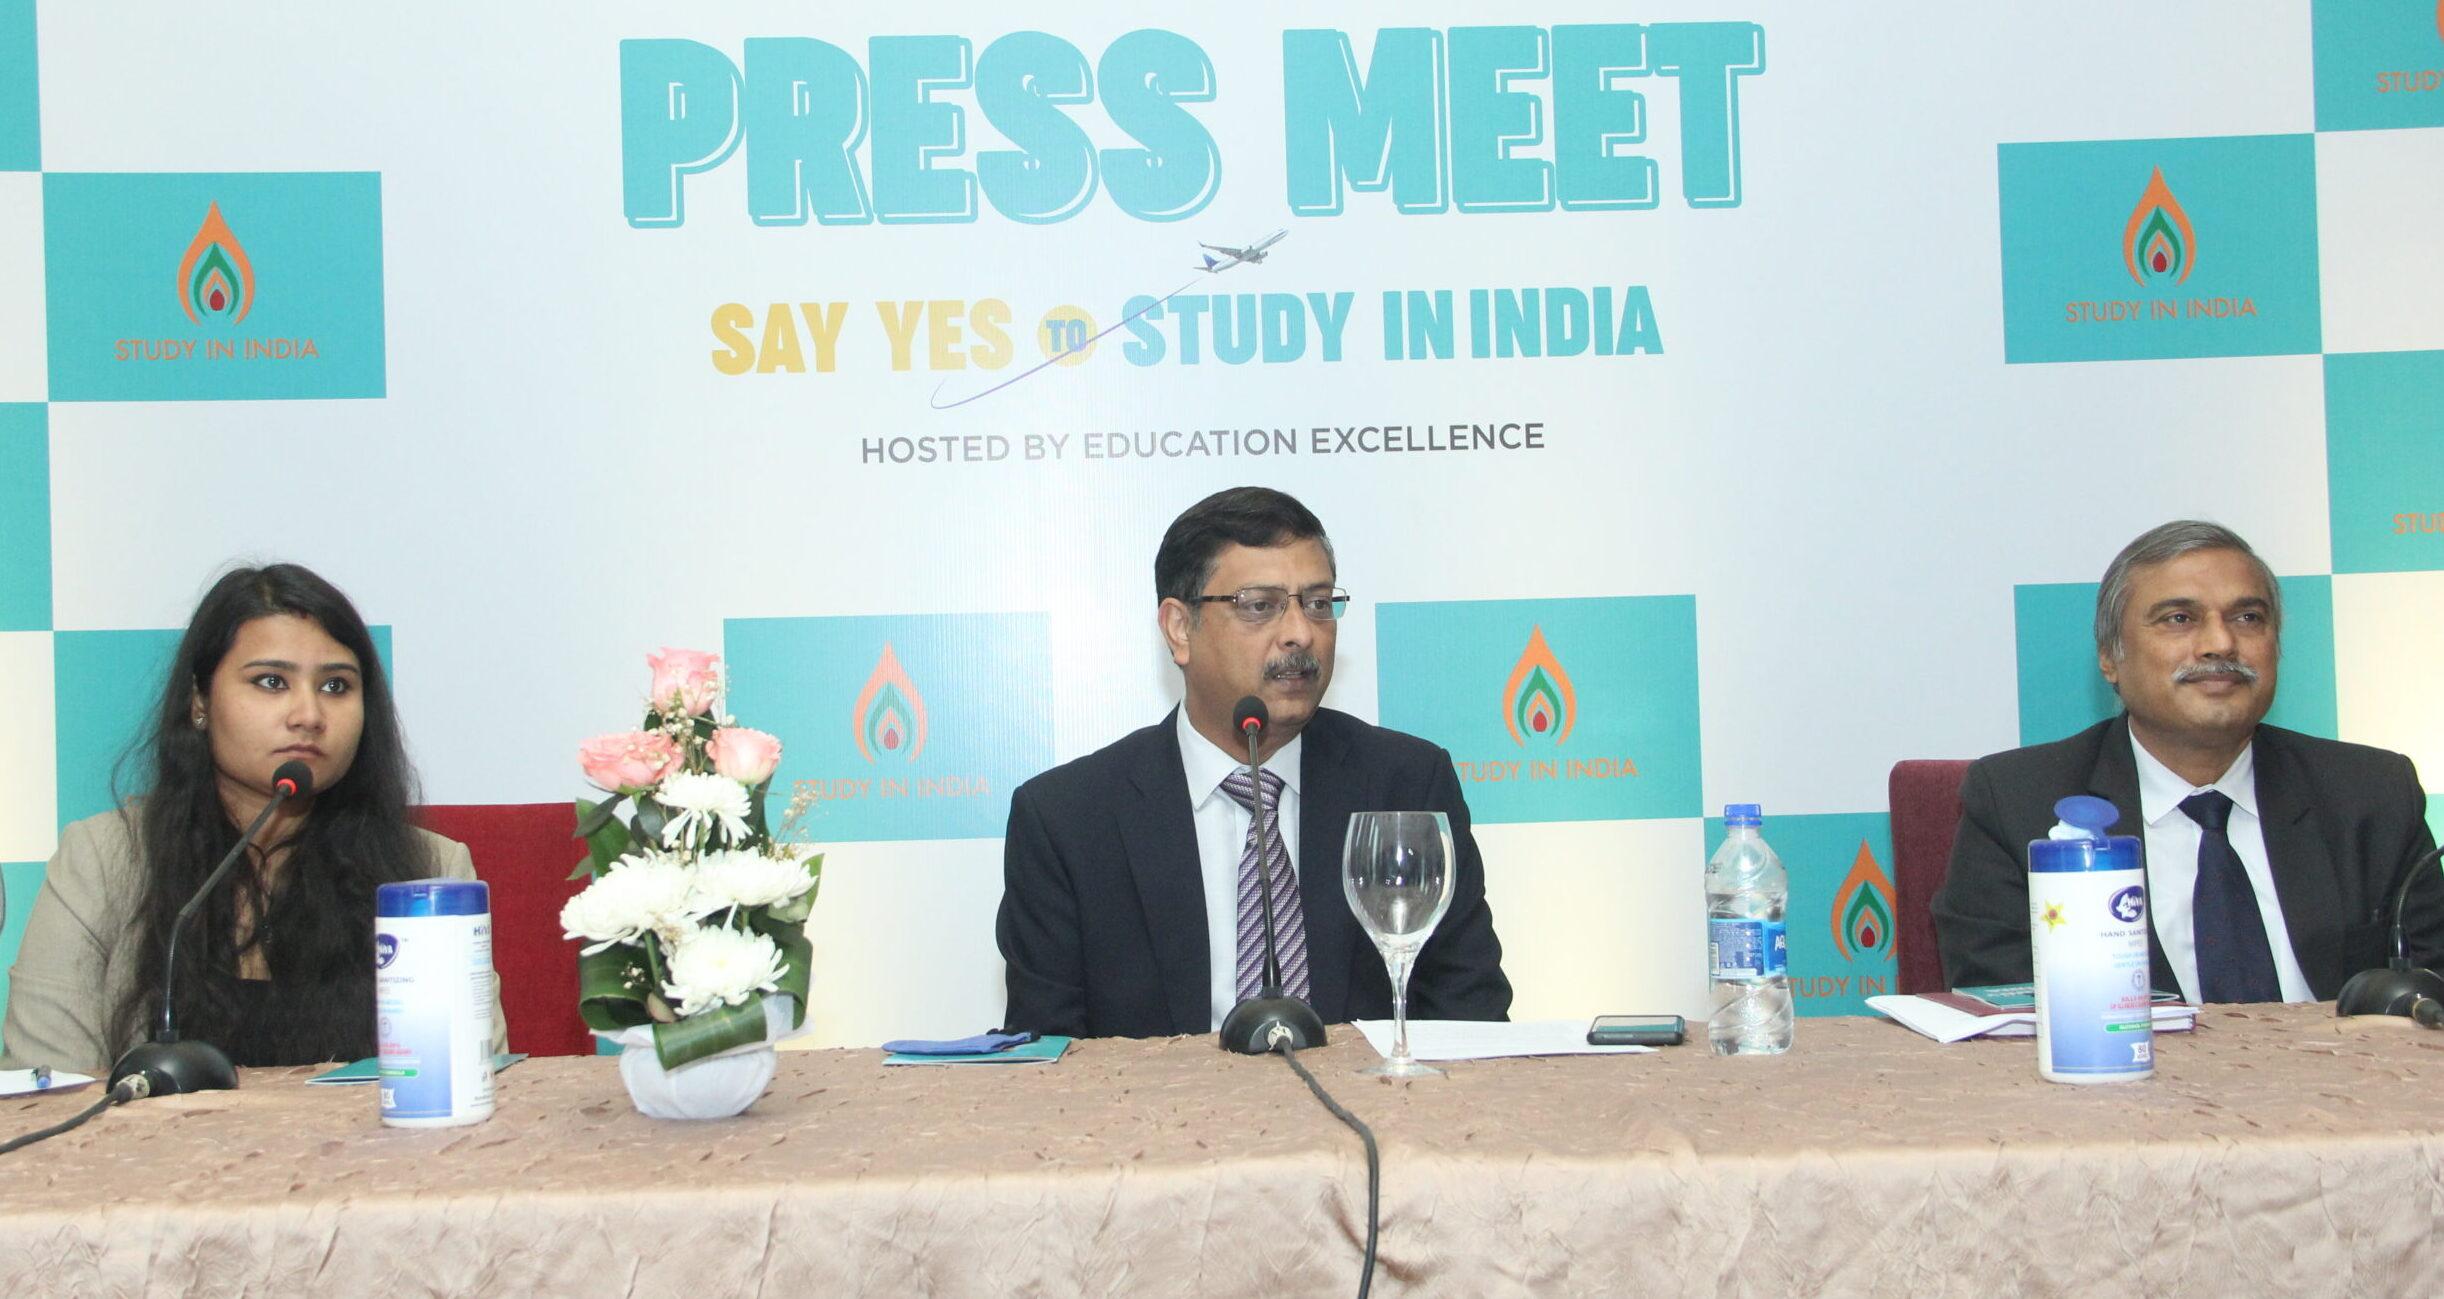 Higher education in India will begin in Dhaka